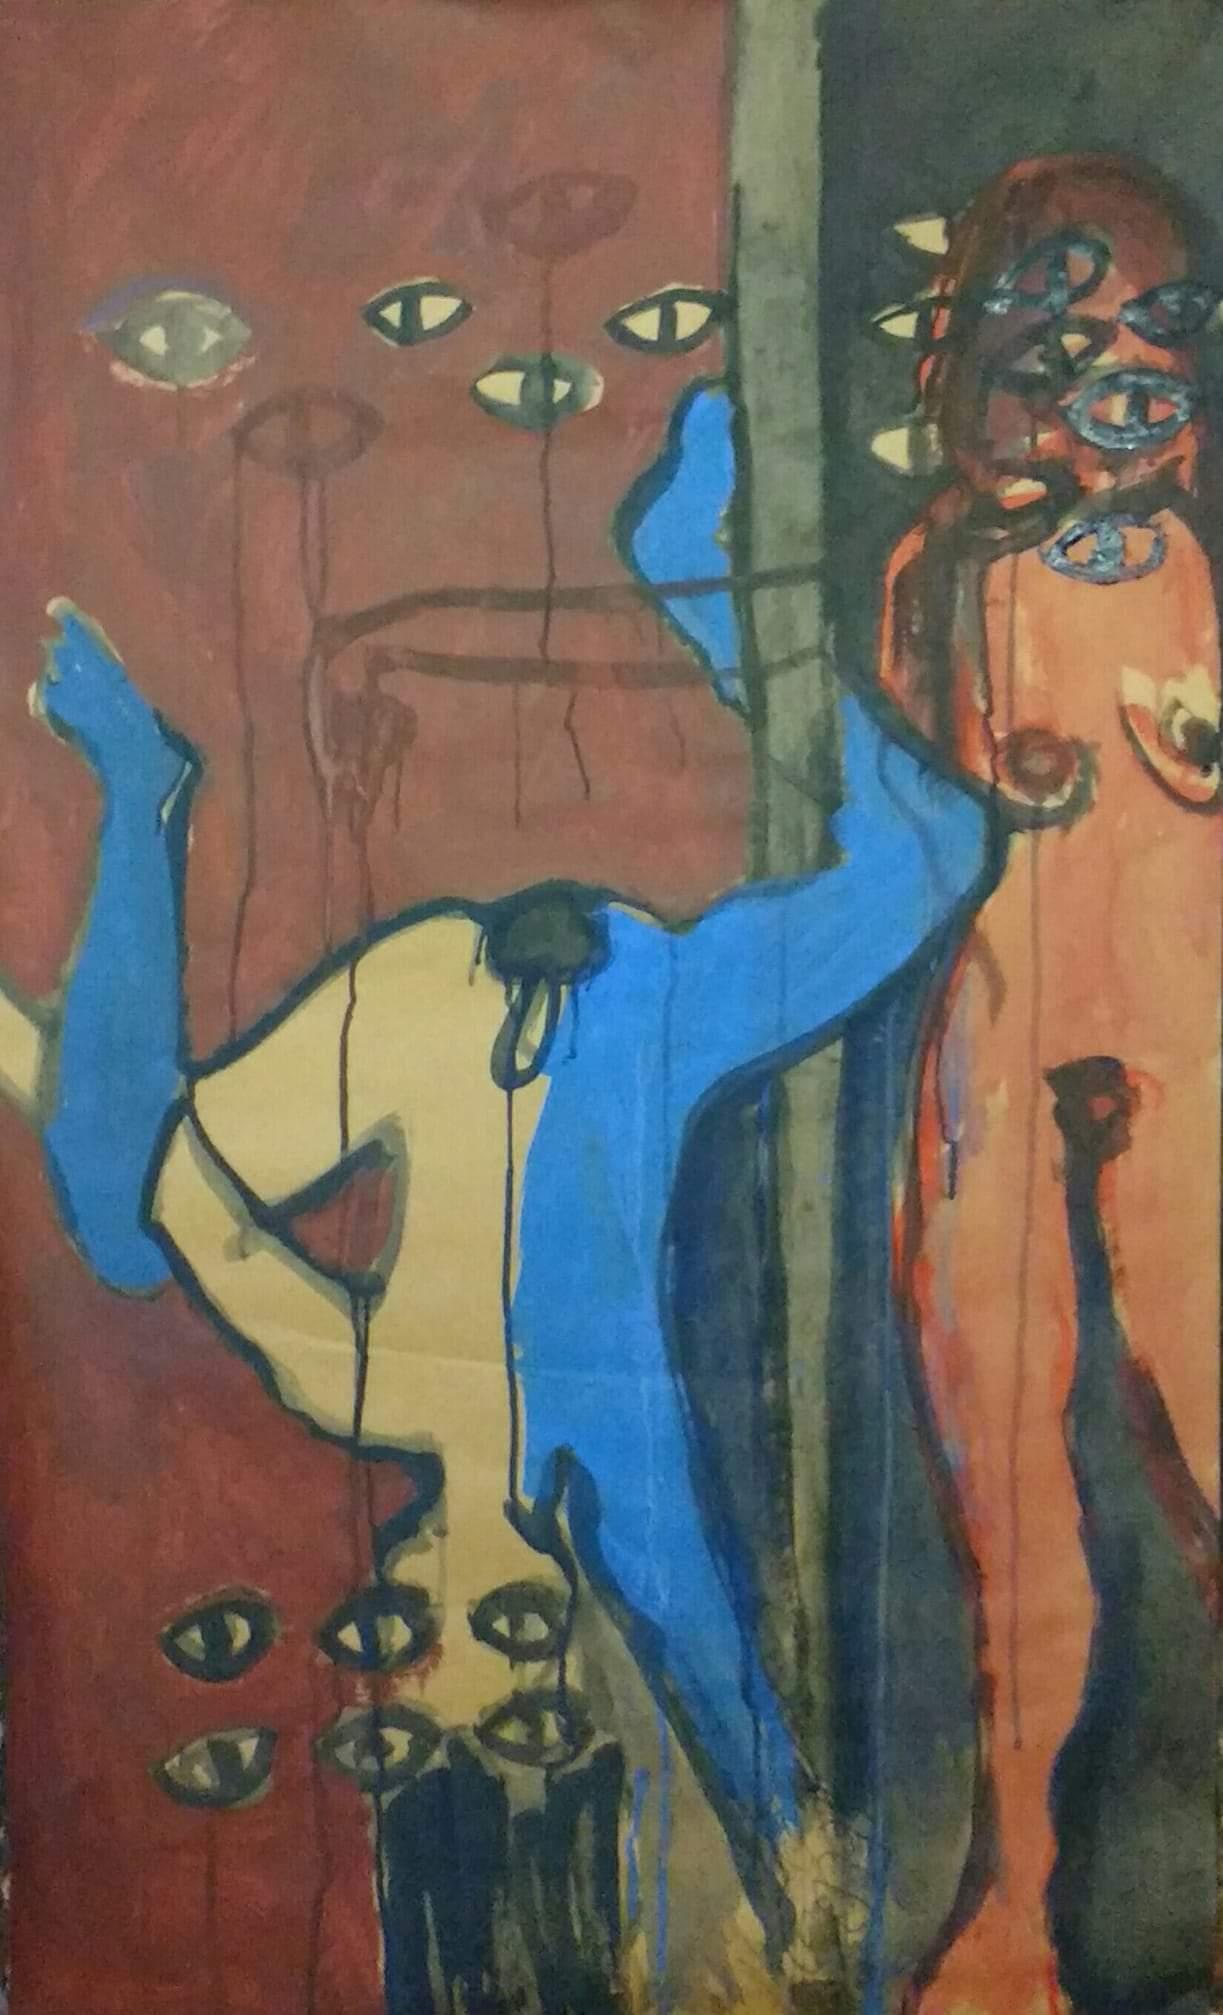 Scumbay Pole Dances for Aphrodite